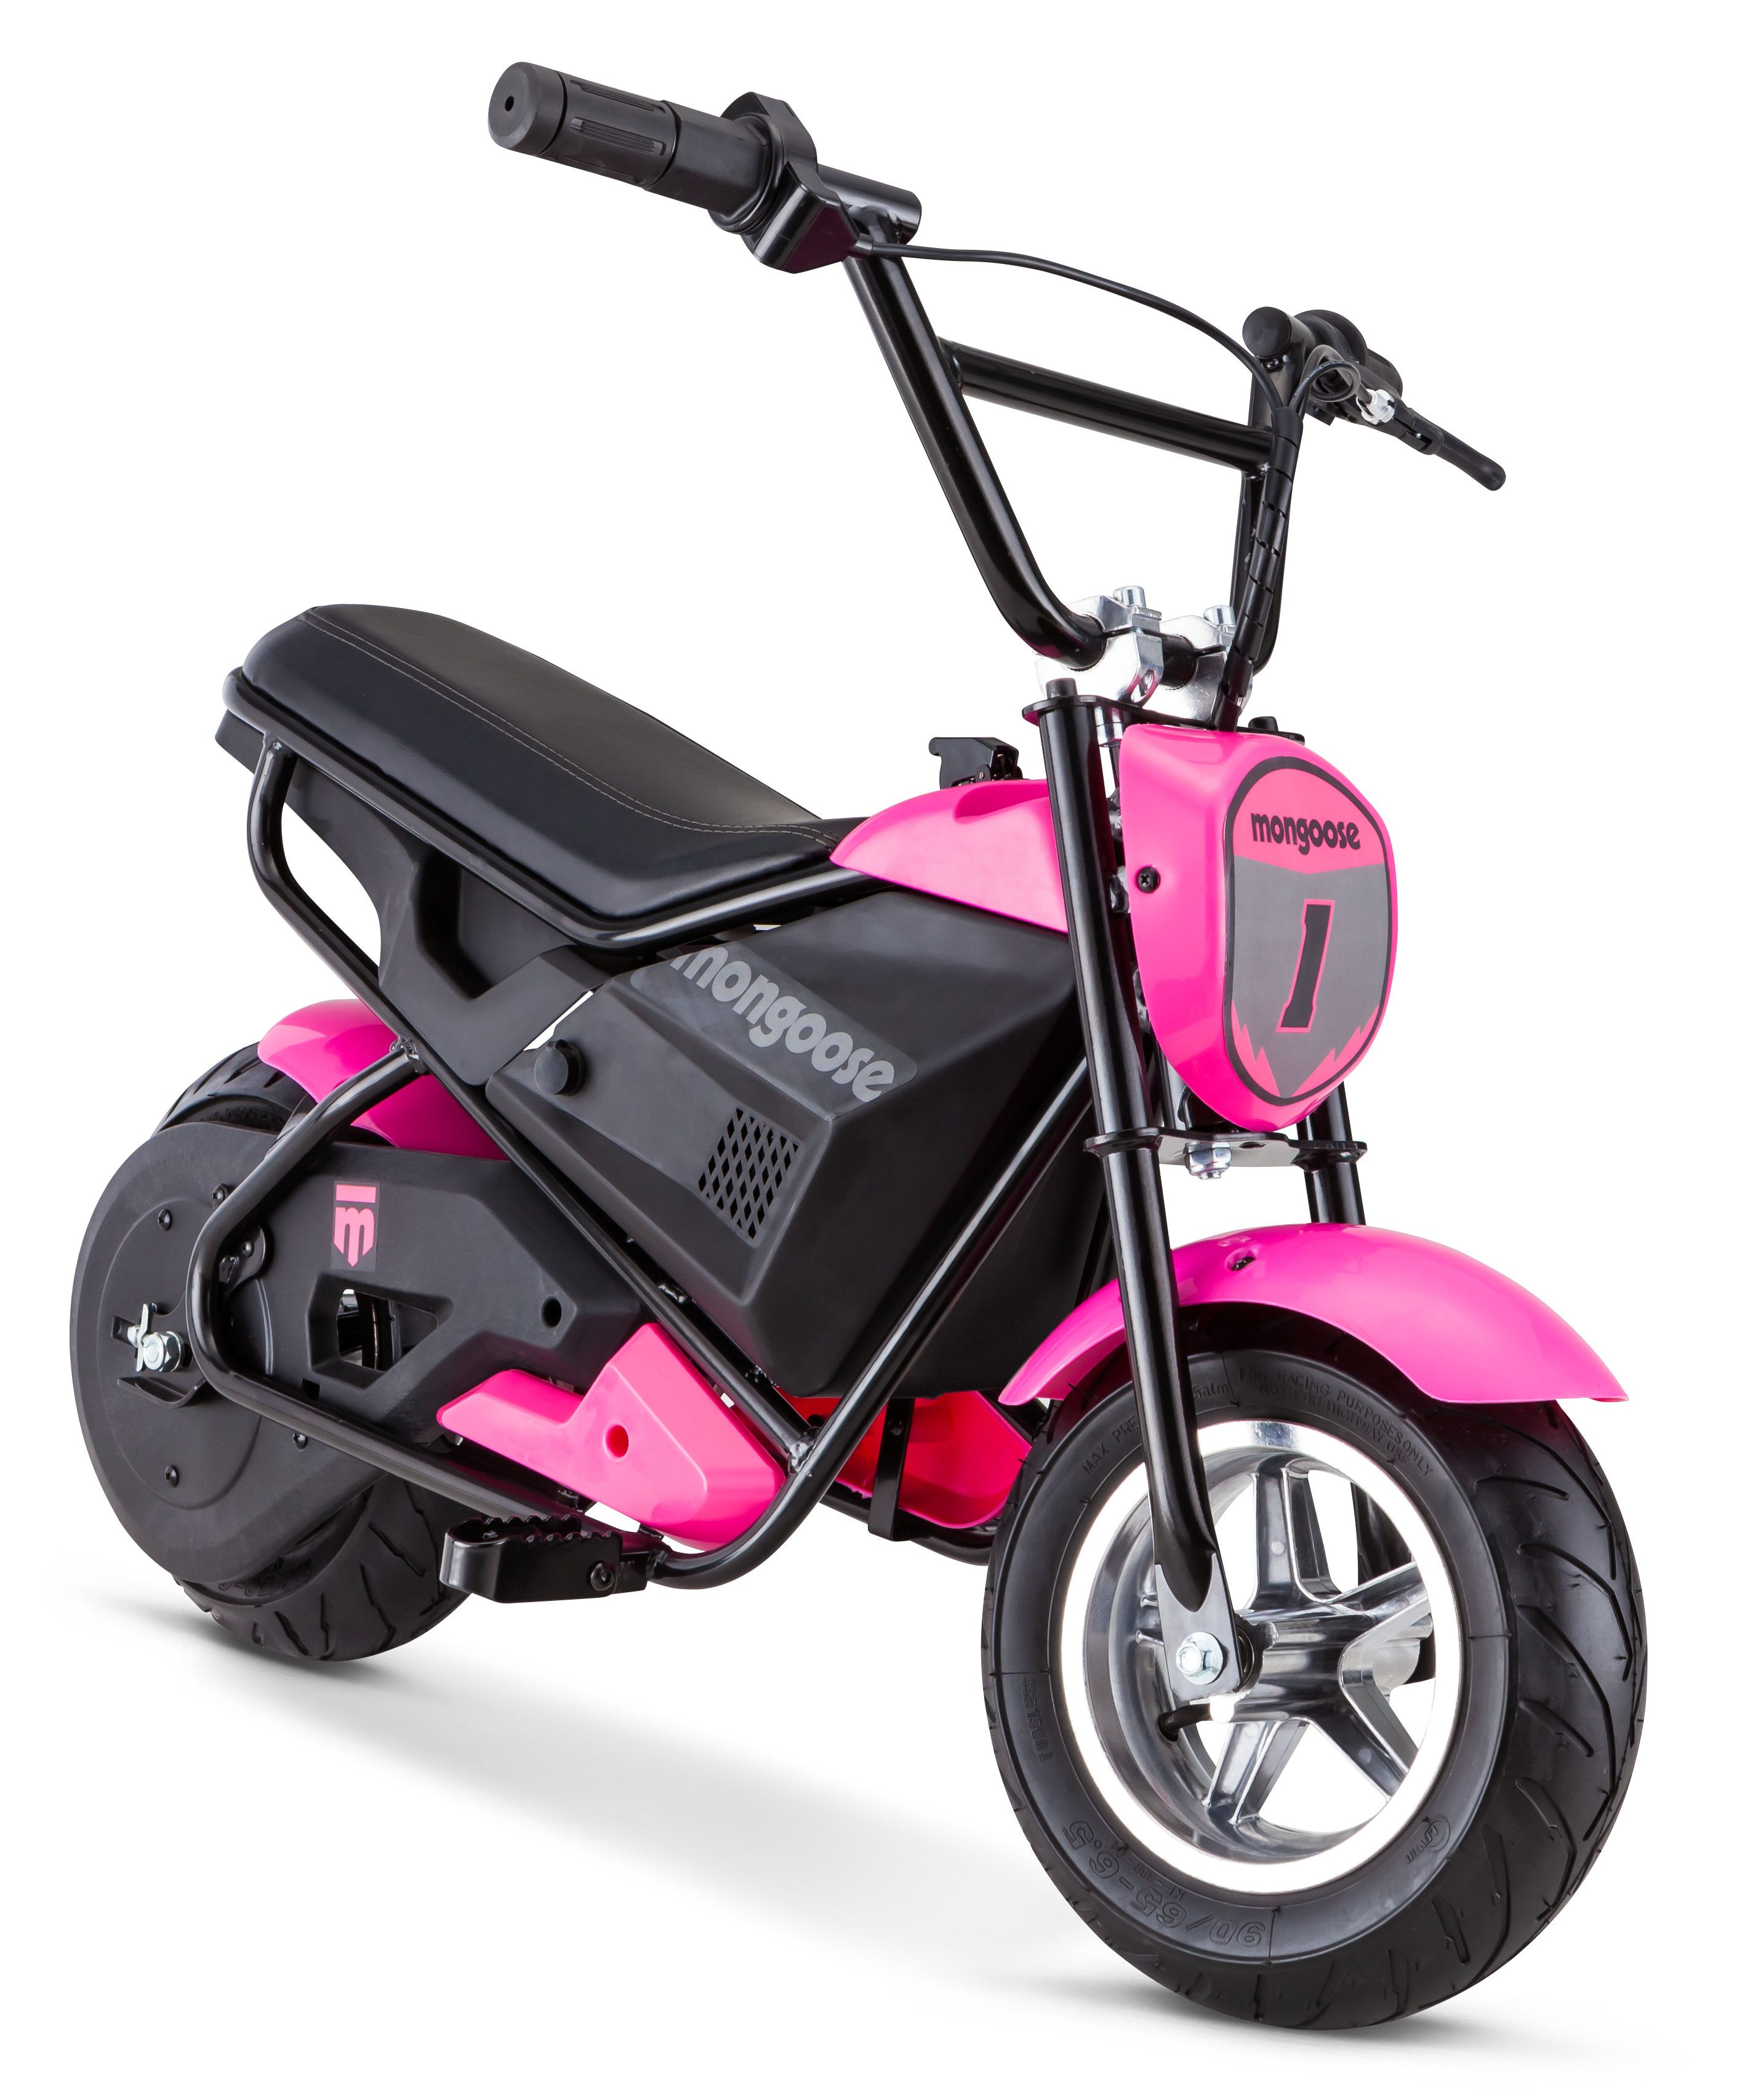 mongoose 24 volt powered mini bike pink hondaelectricscooter electricbikeforkids tvsbike jawabike [ 2830 x 3412 Pixel ]